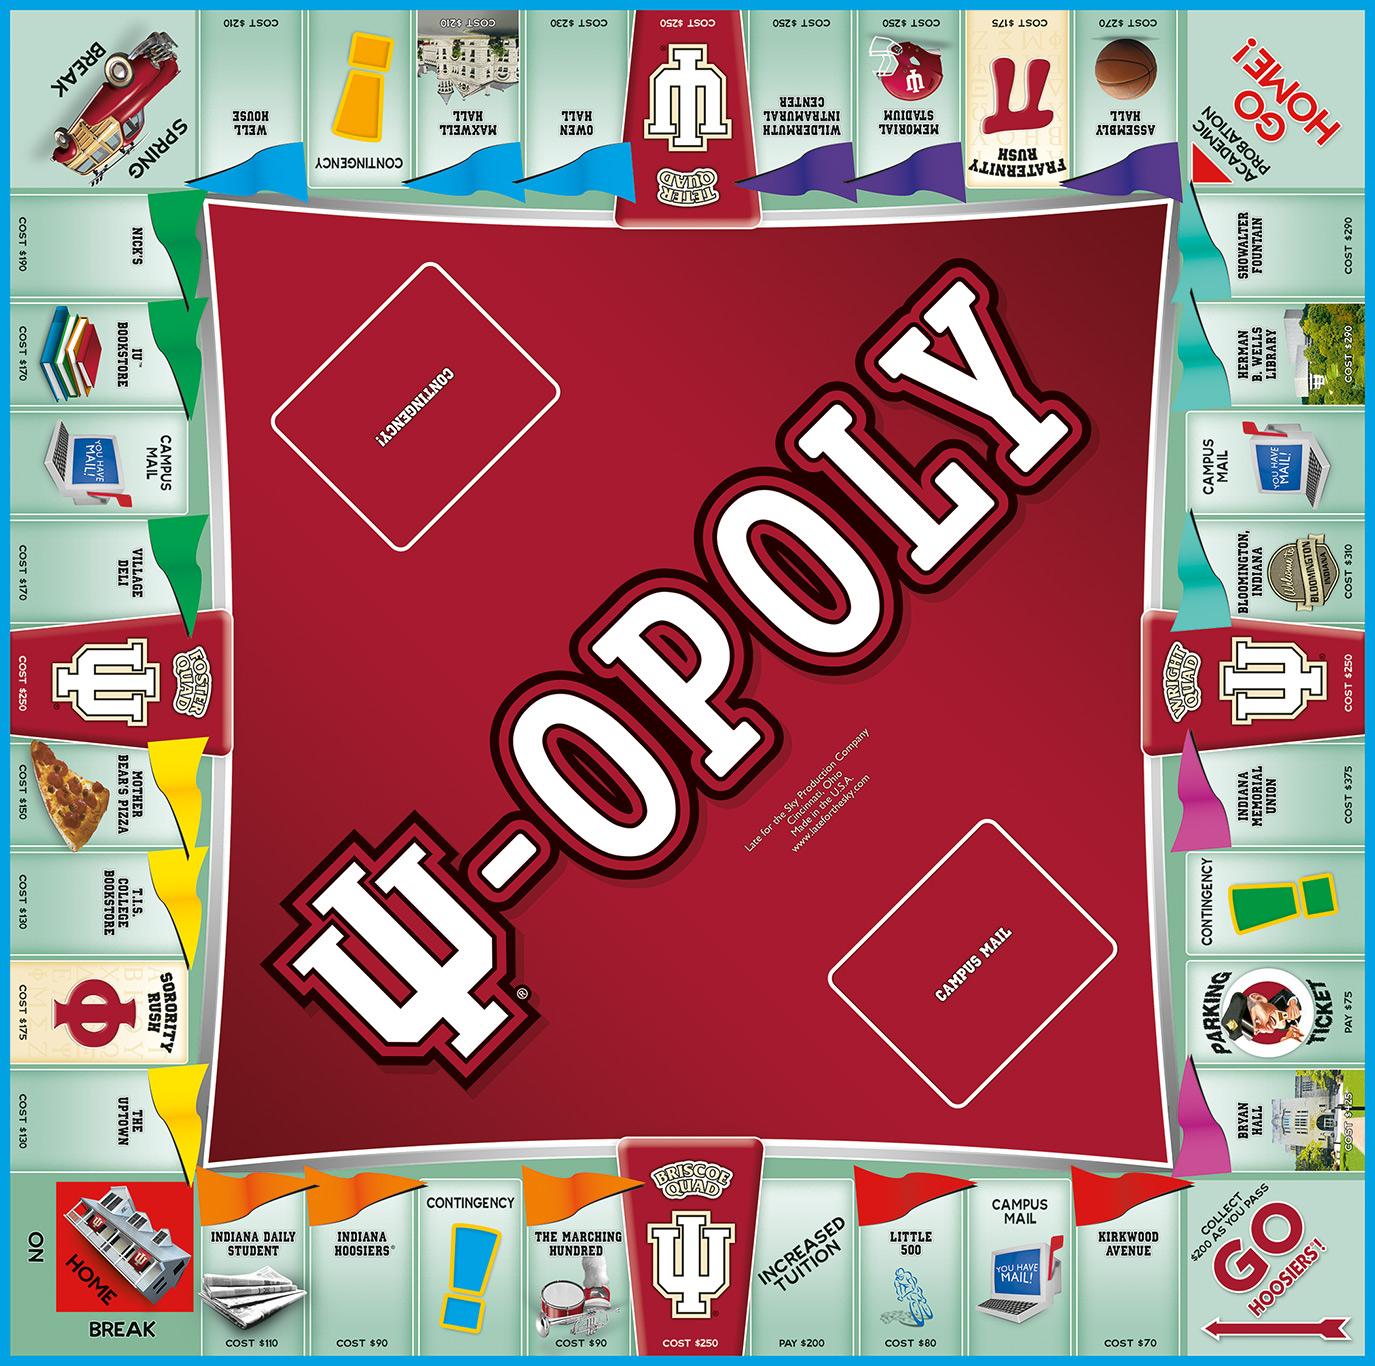 IUOPOLY Board Game